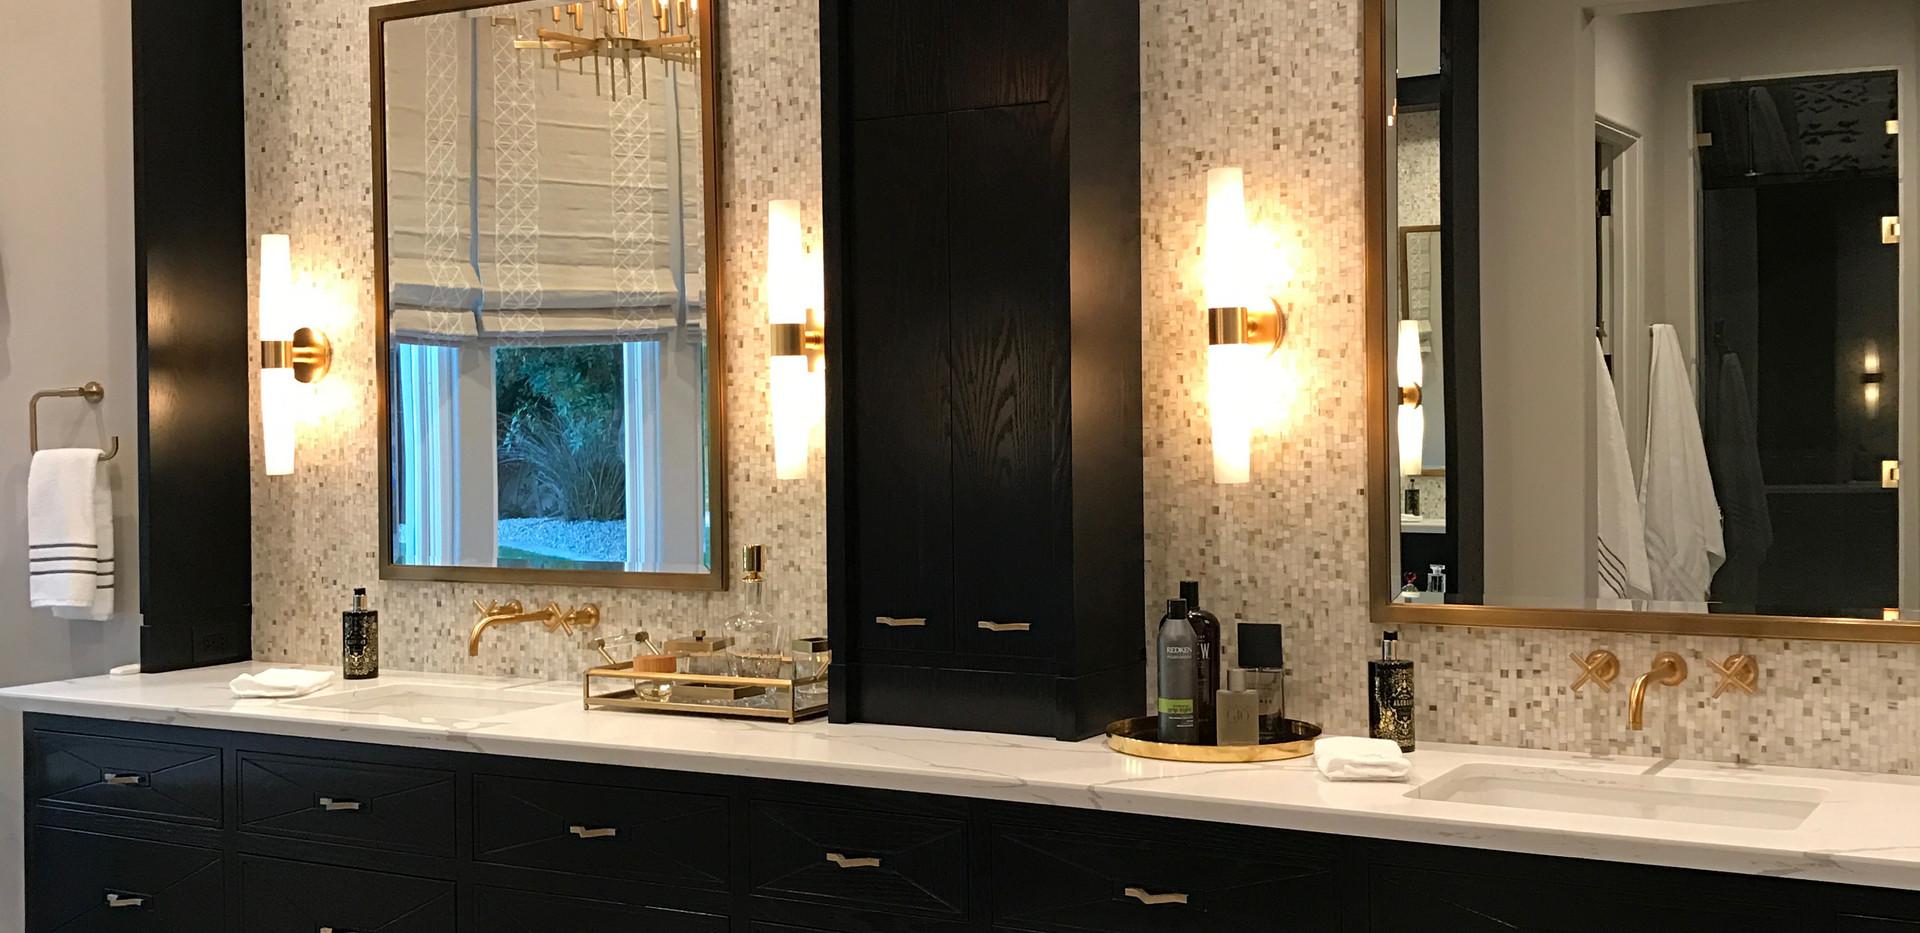 Mastro Bathroom 2.JPG